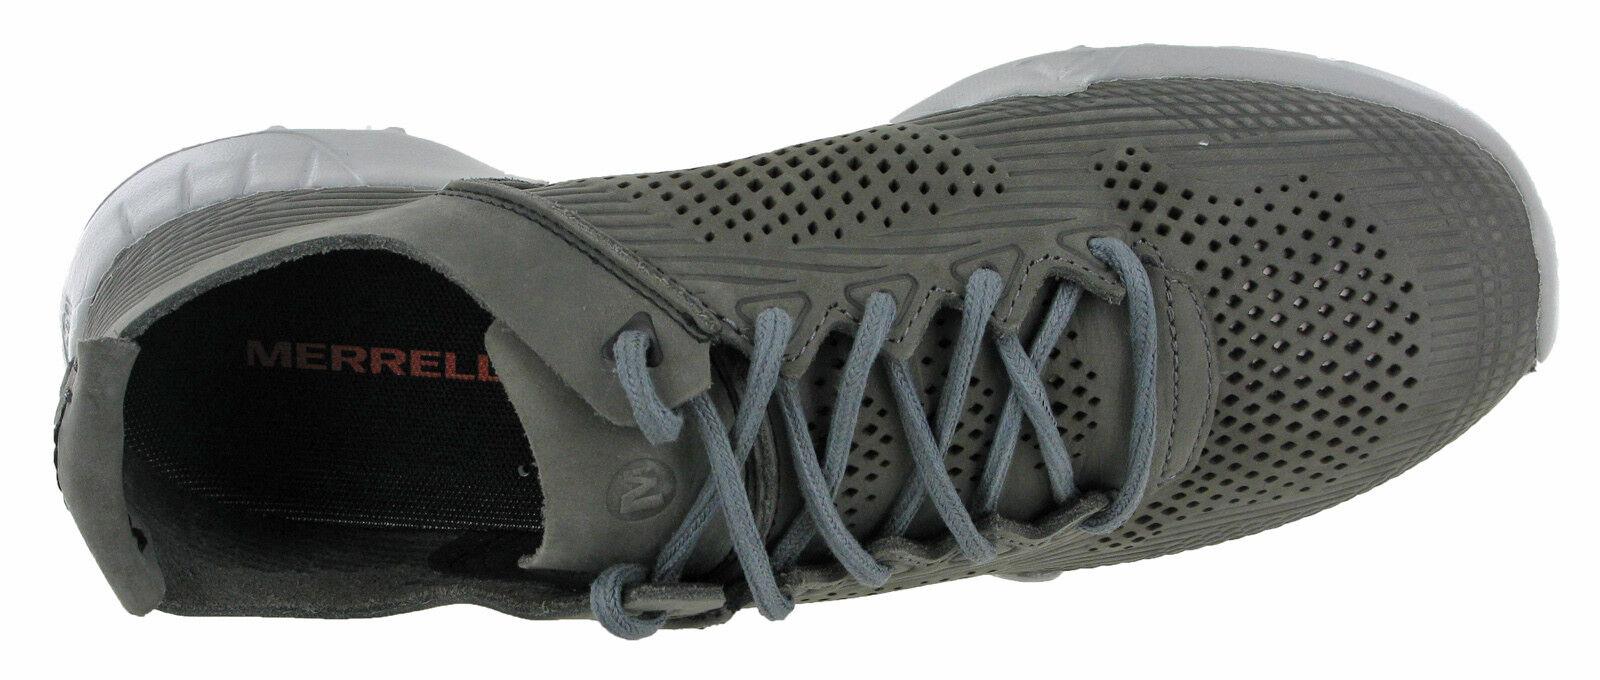 Merrell Versent Versent Versent LTR Perf Trainers Mens Leather Running Sports Fashion J91451 5e9ef1